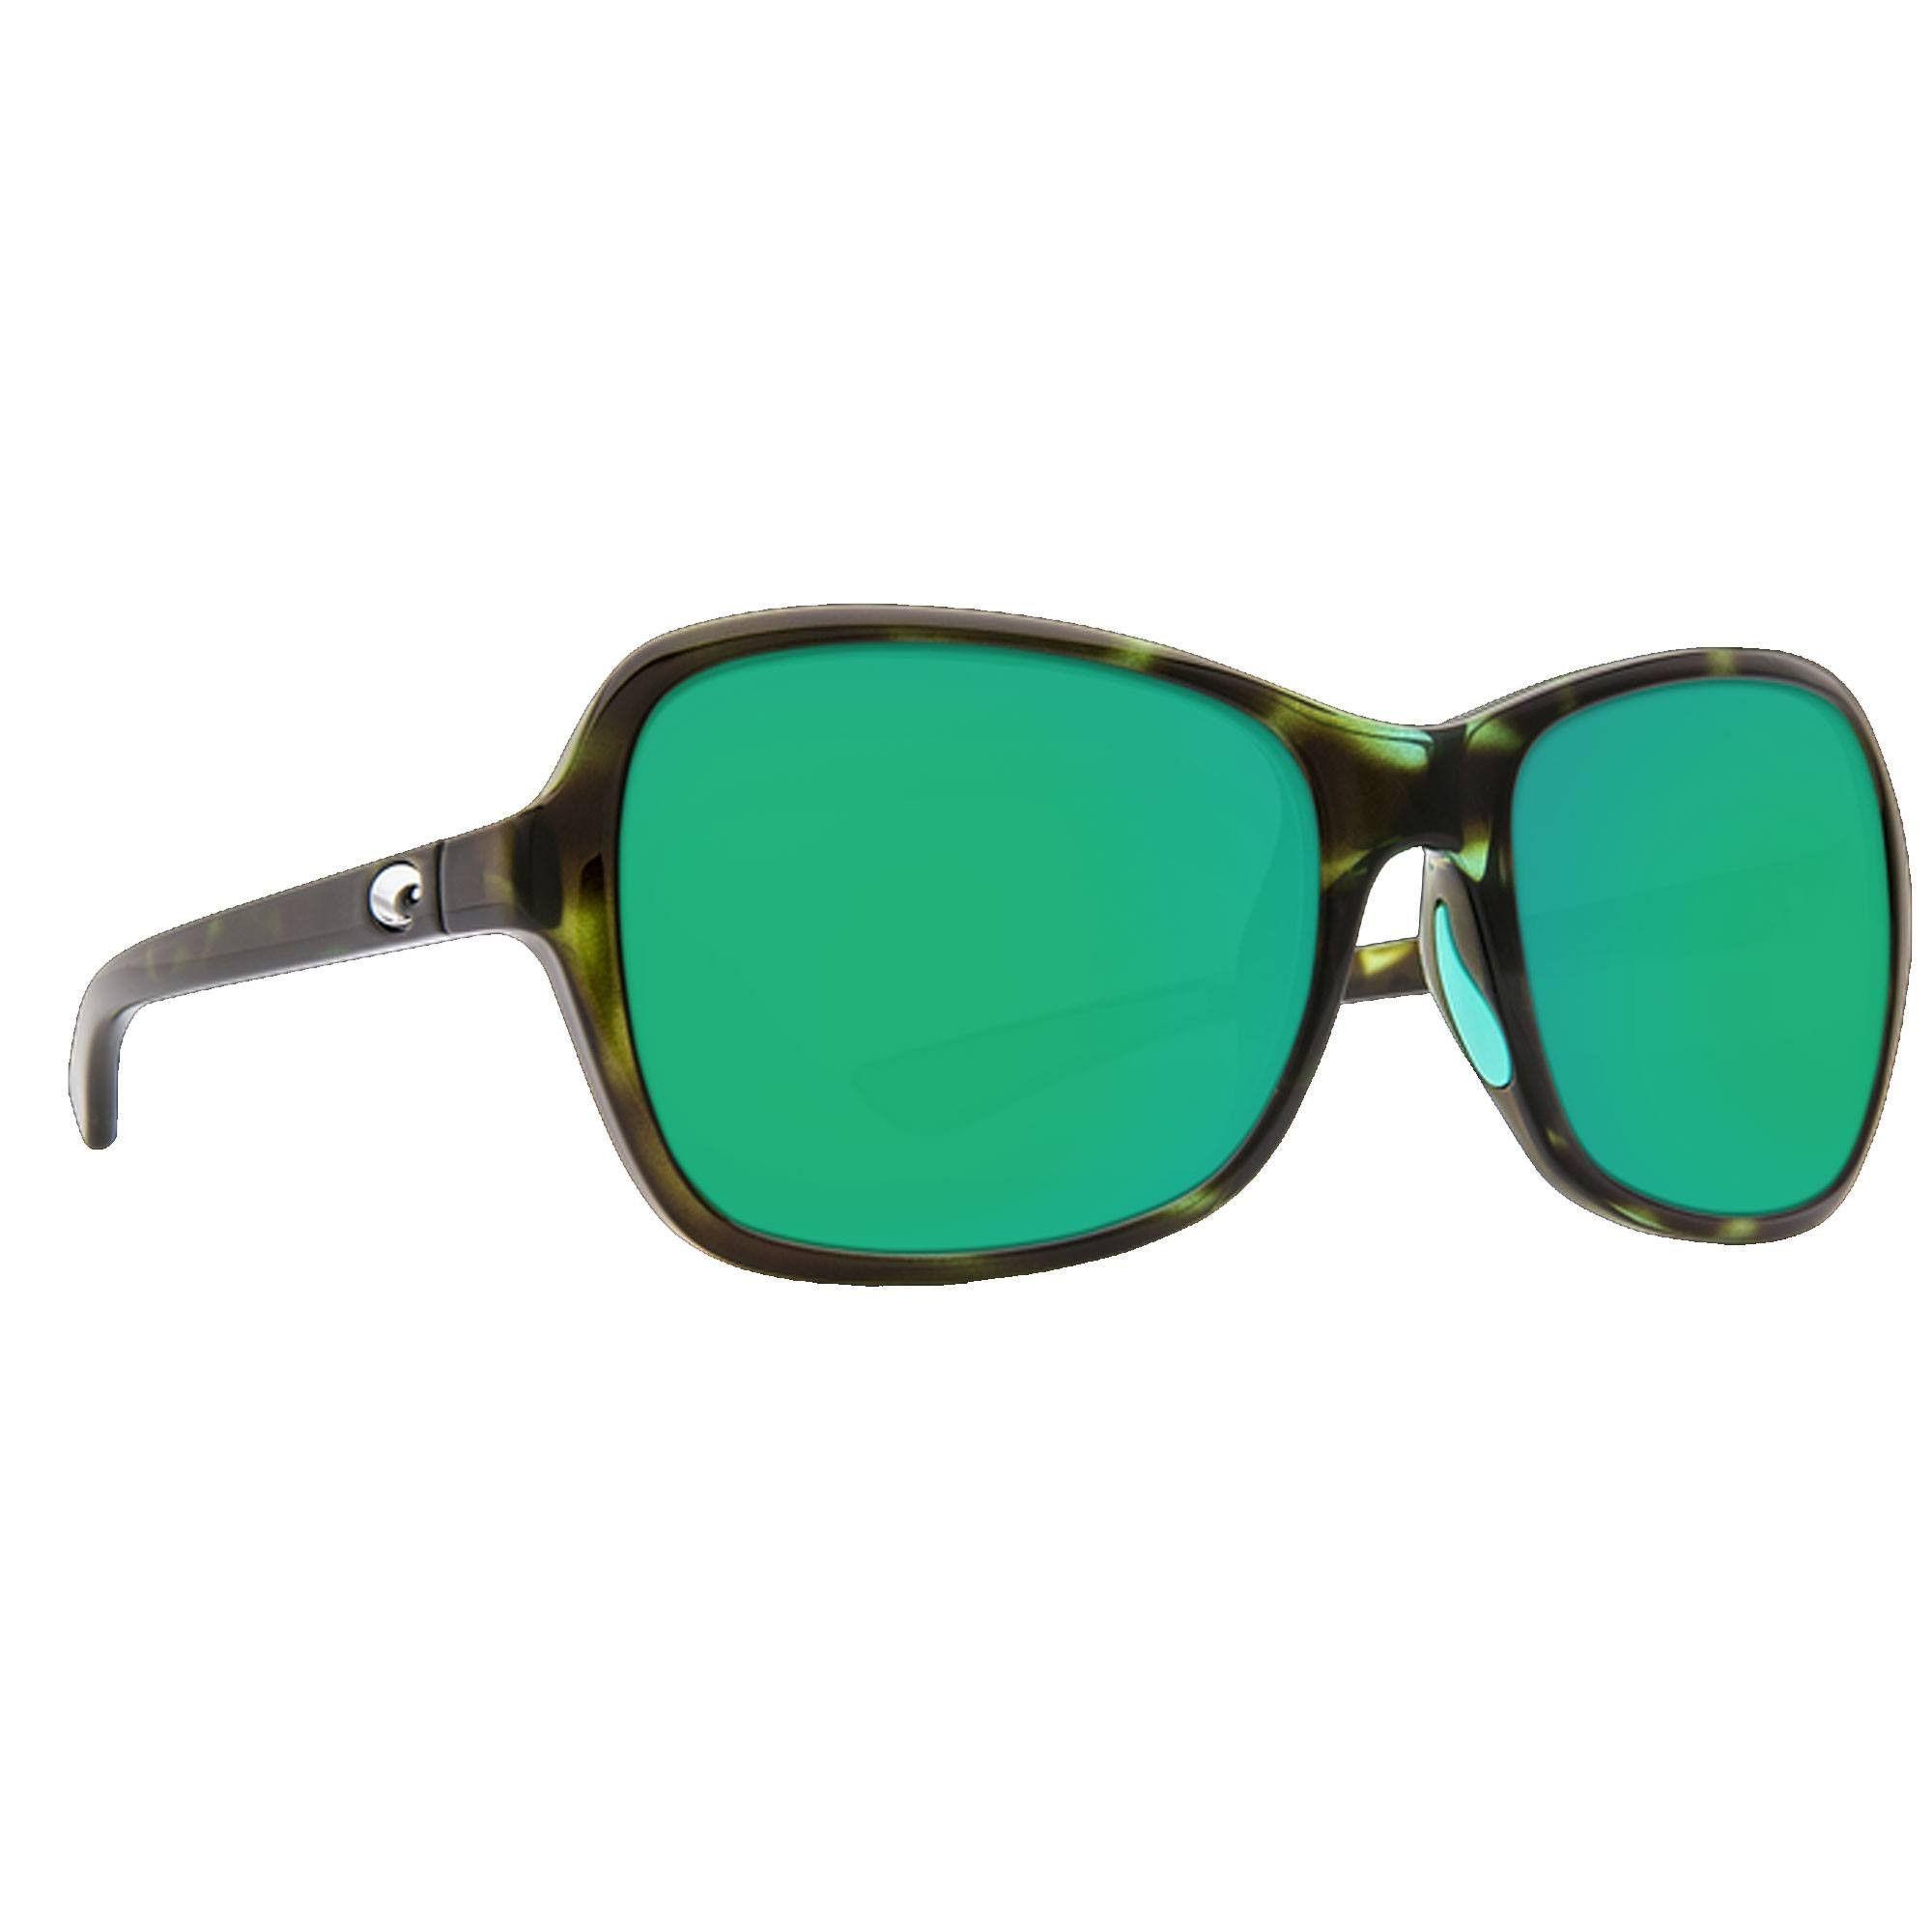 fcab4d8be20 Costa Shiny Kiwi Tortoise Green Mirror Kare 580P Sunglasses